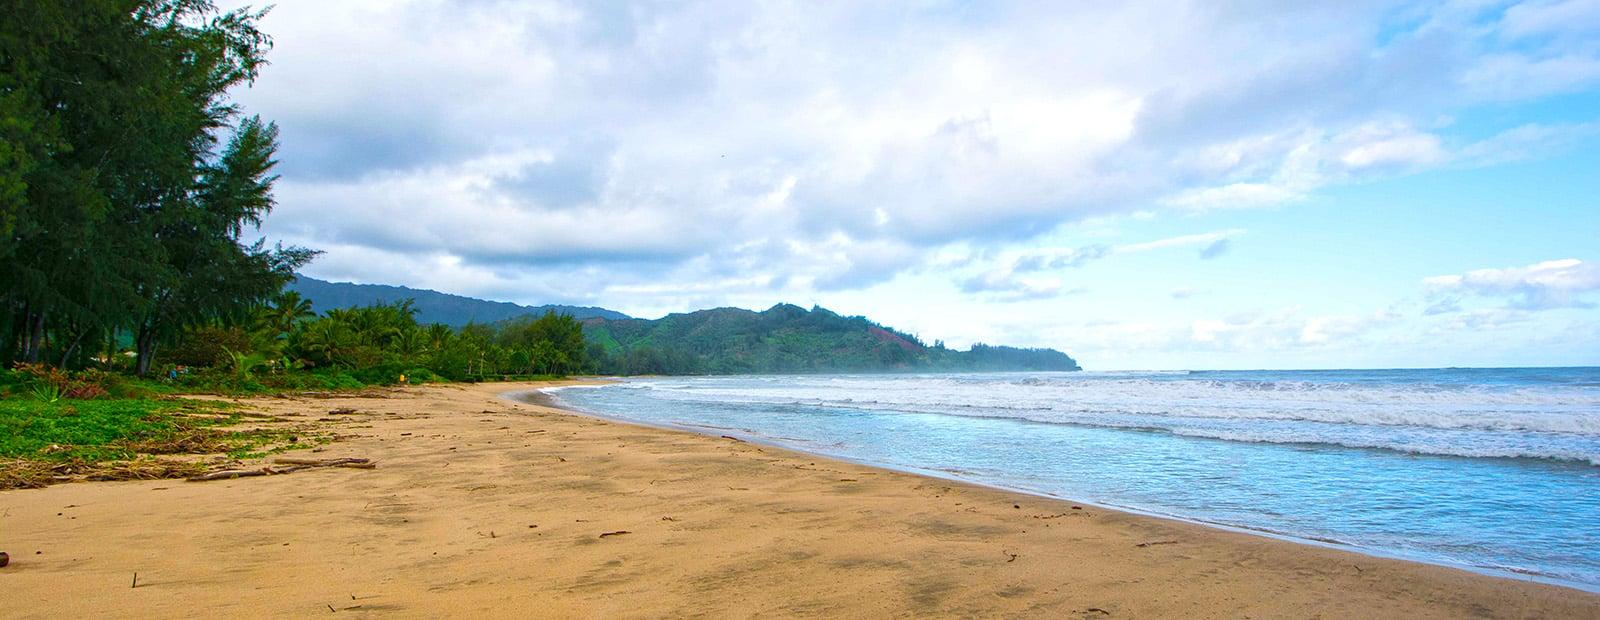 Kauai Ultimate Visitor Guide